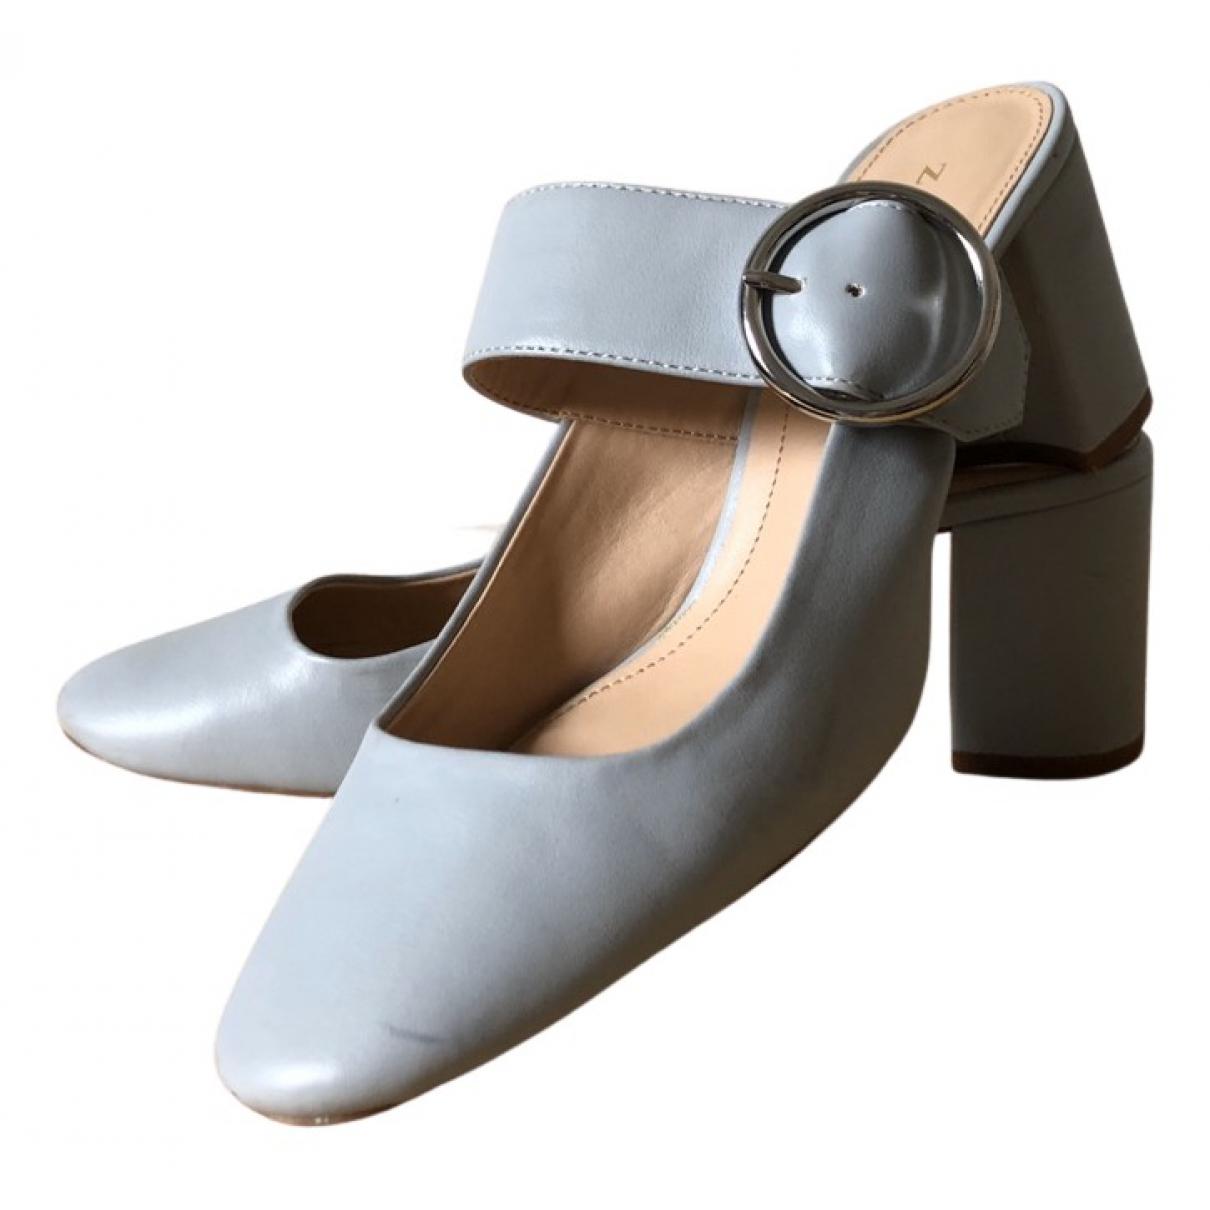 Zara - Escarpins   pour femme en cuir - bleu